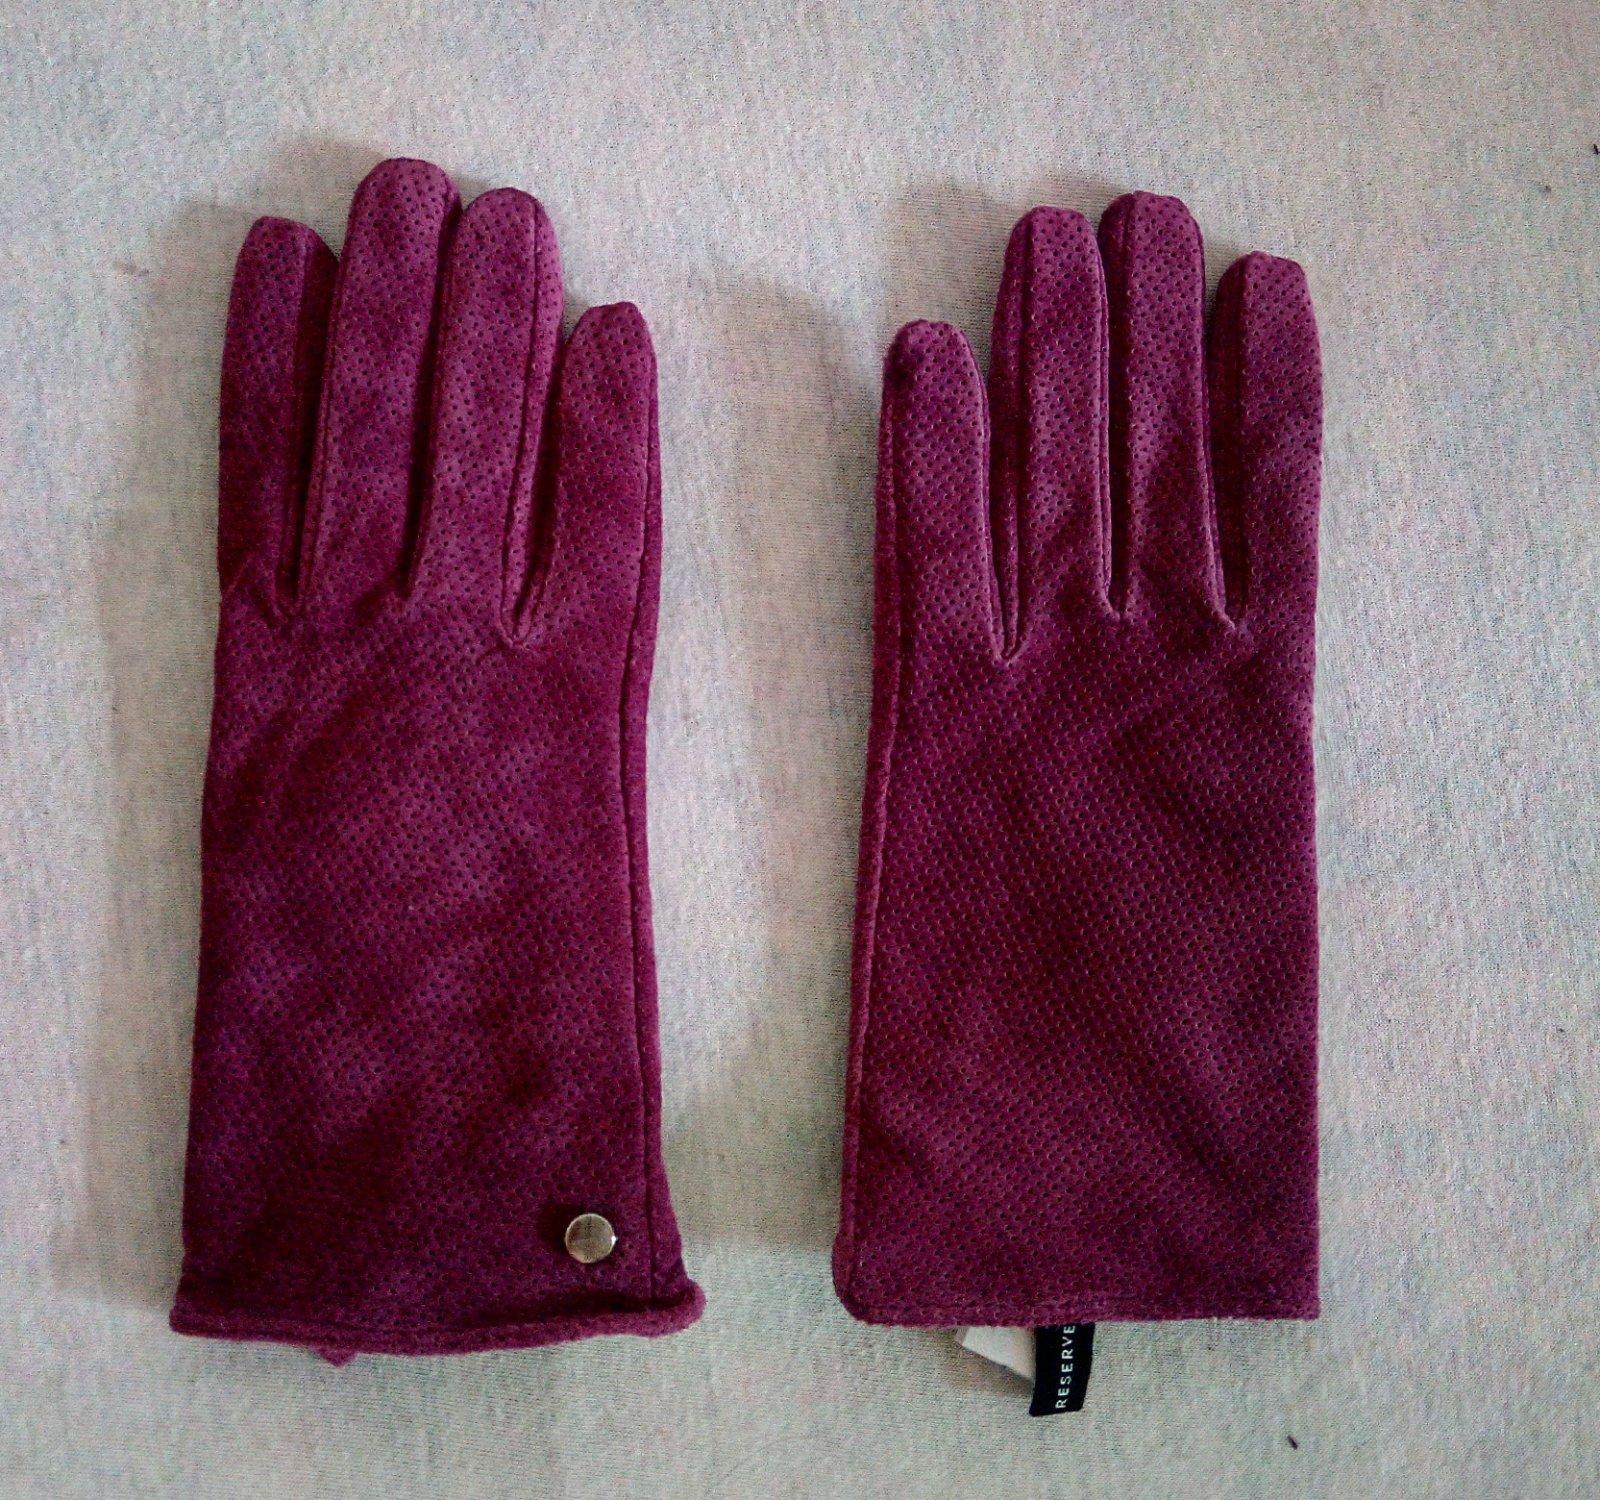 Fialové kožené rukavice Reserved S - Obrázok č. 3